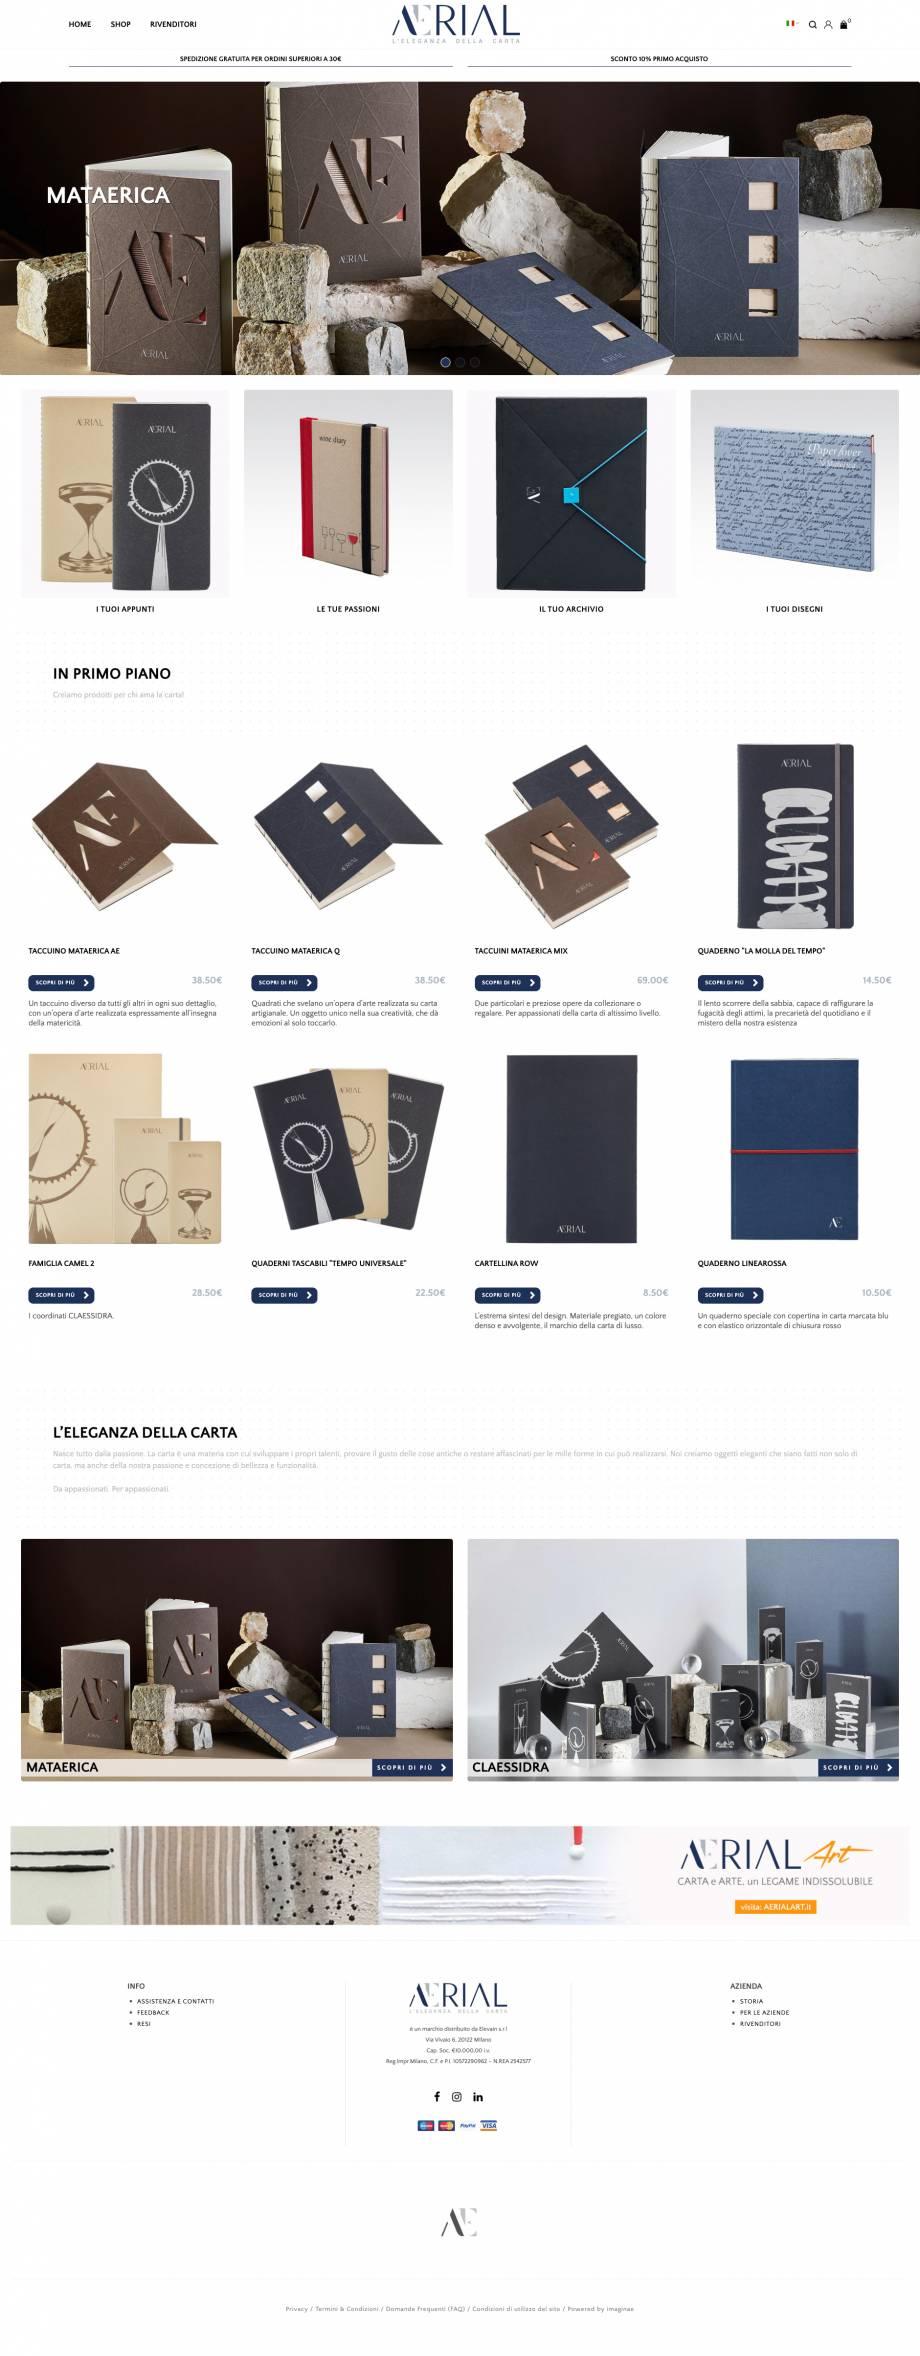 Web Design, Logo Design, E-Commerce, Web Site, Social Media Strategy, Branding, Responsive Smartphone & Tablet, Facebook Advertising, Google AdWords - Campagne Search,